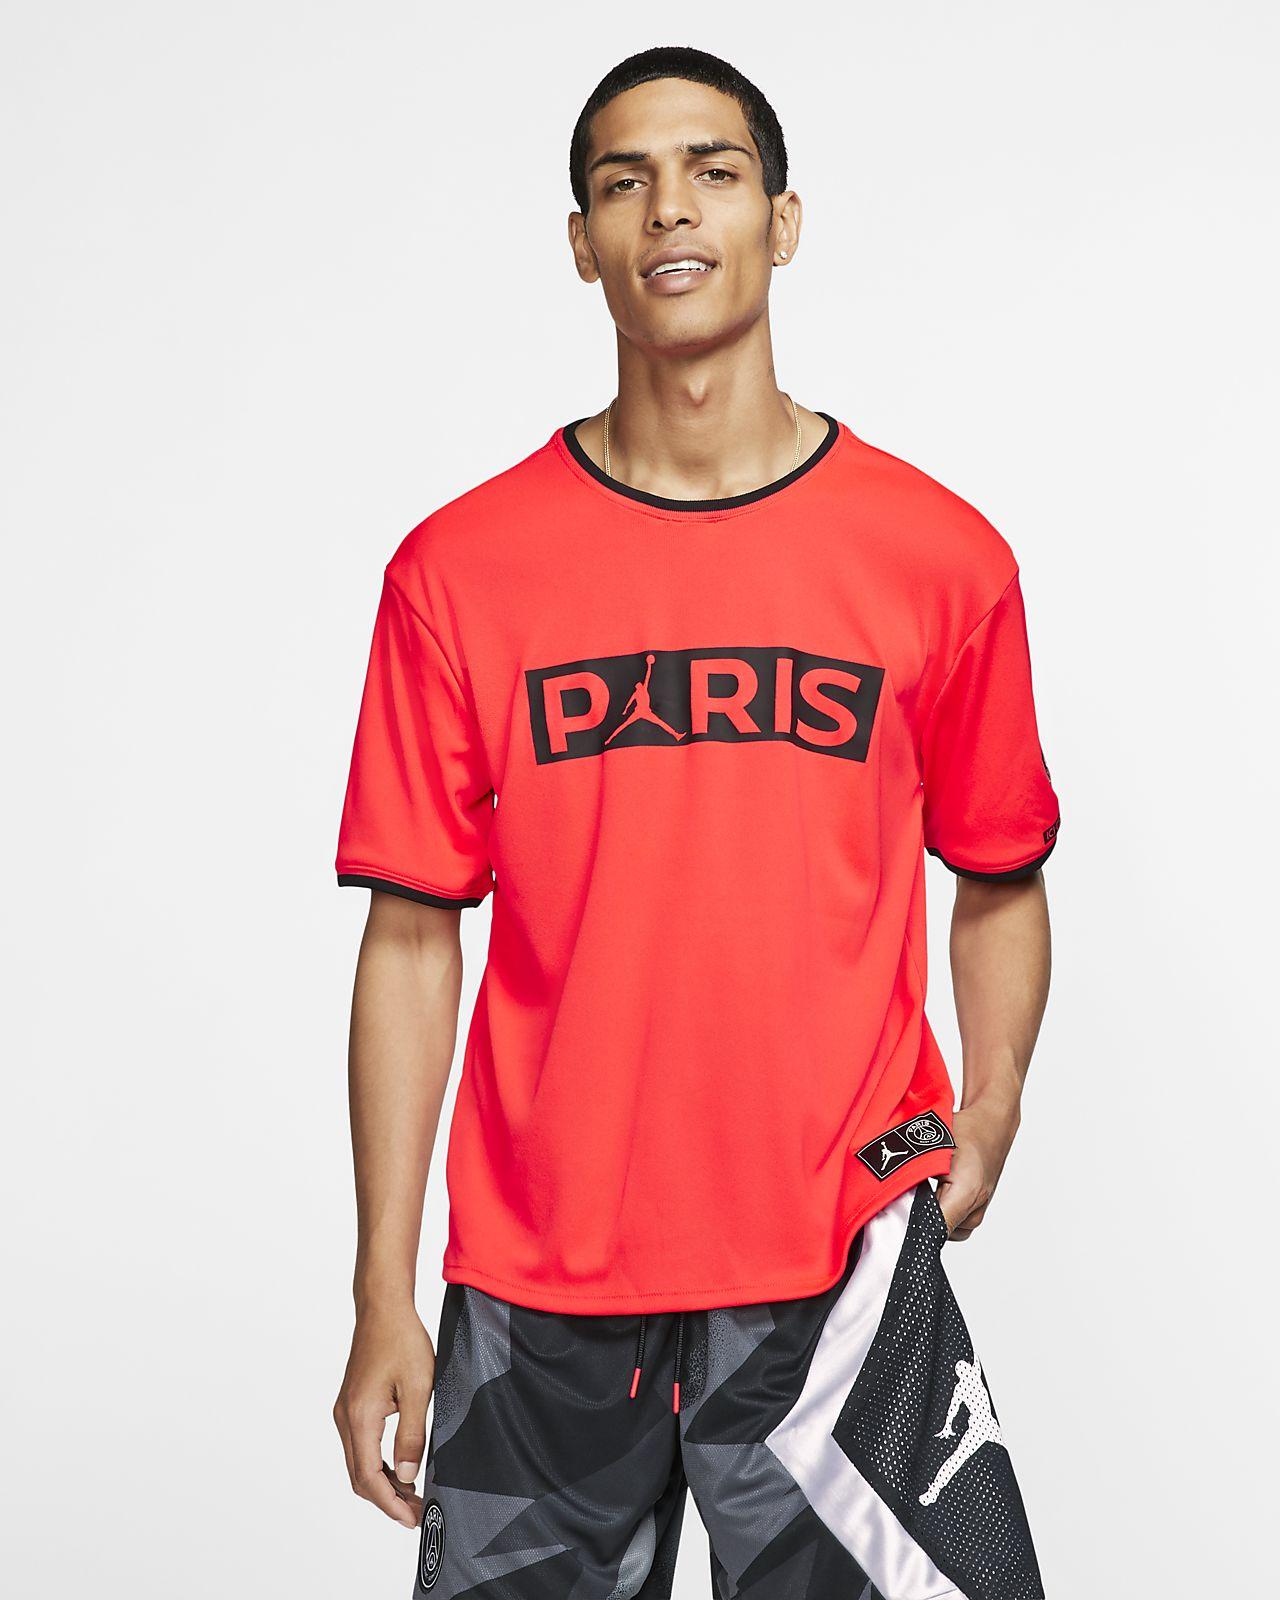 París Saint-Germain Camiseta de fútbol de manga corta de réplica - Hombre